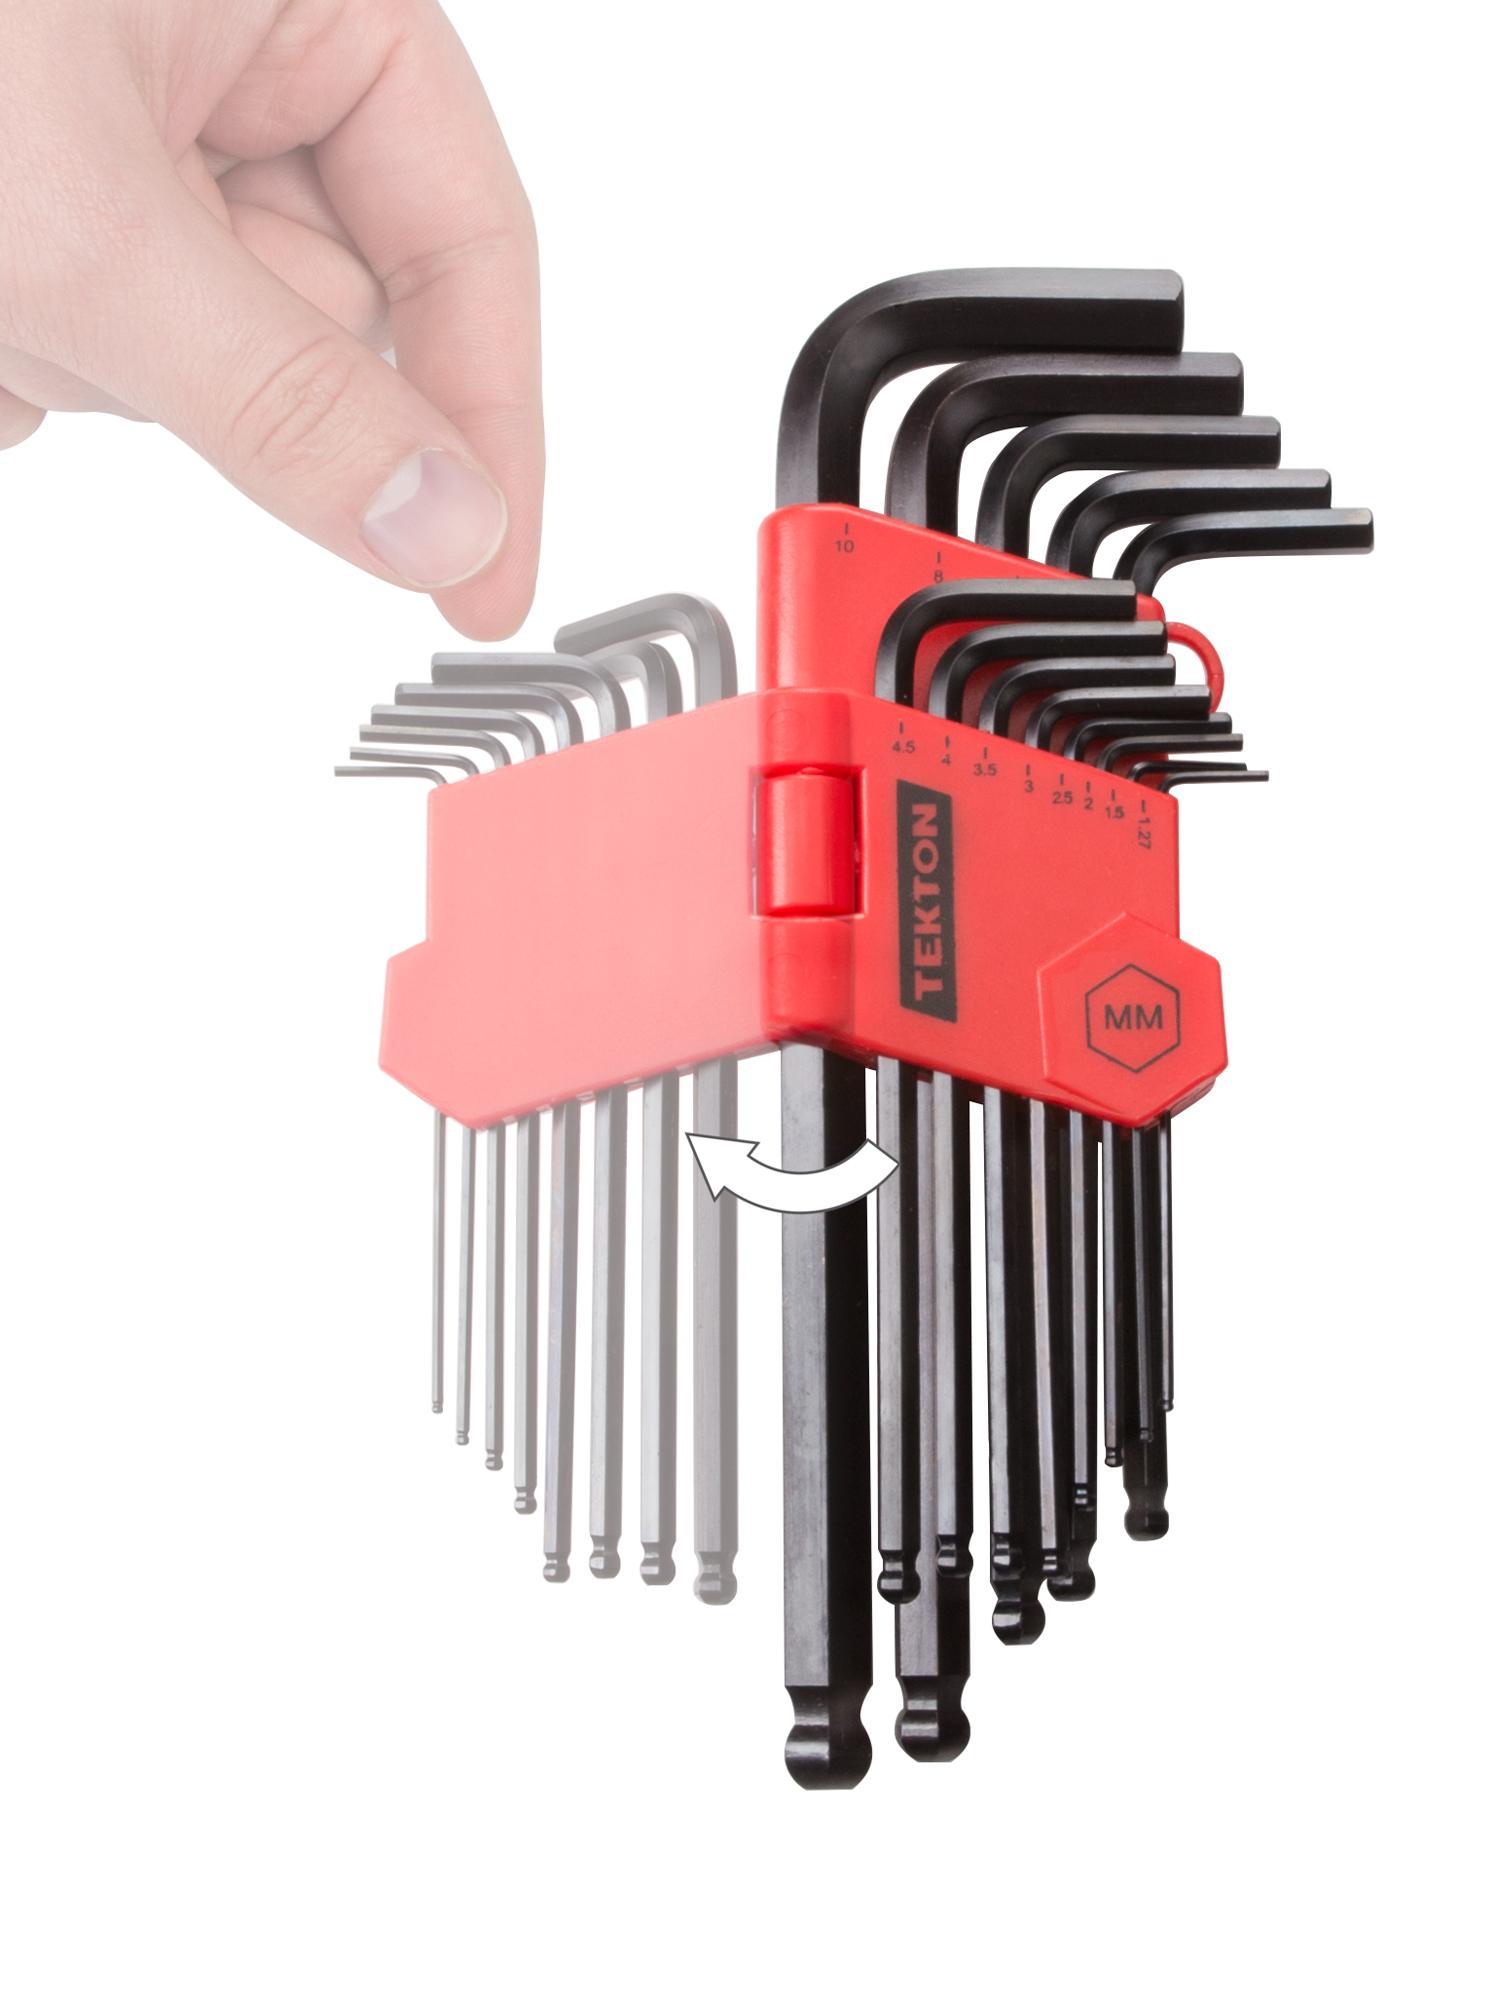 tekton long arm ball end hex key wrench set metric 13 piece 25272. Black Bedroom Furniture Sets. Home Design Ideas